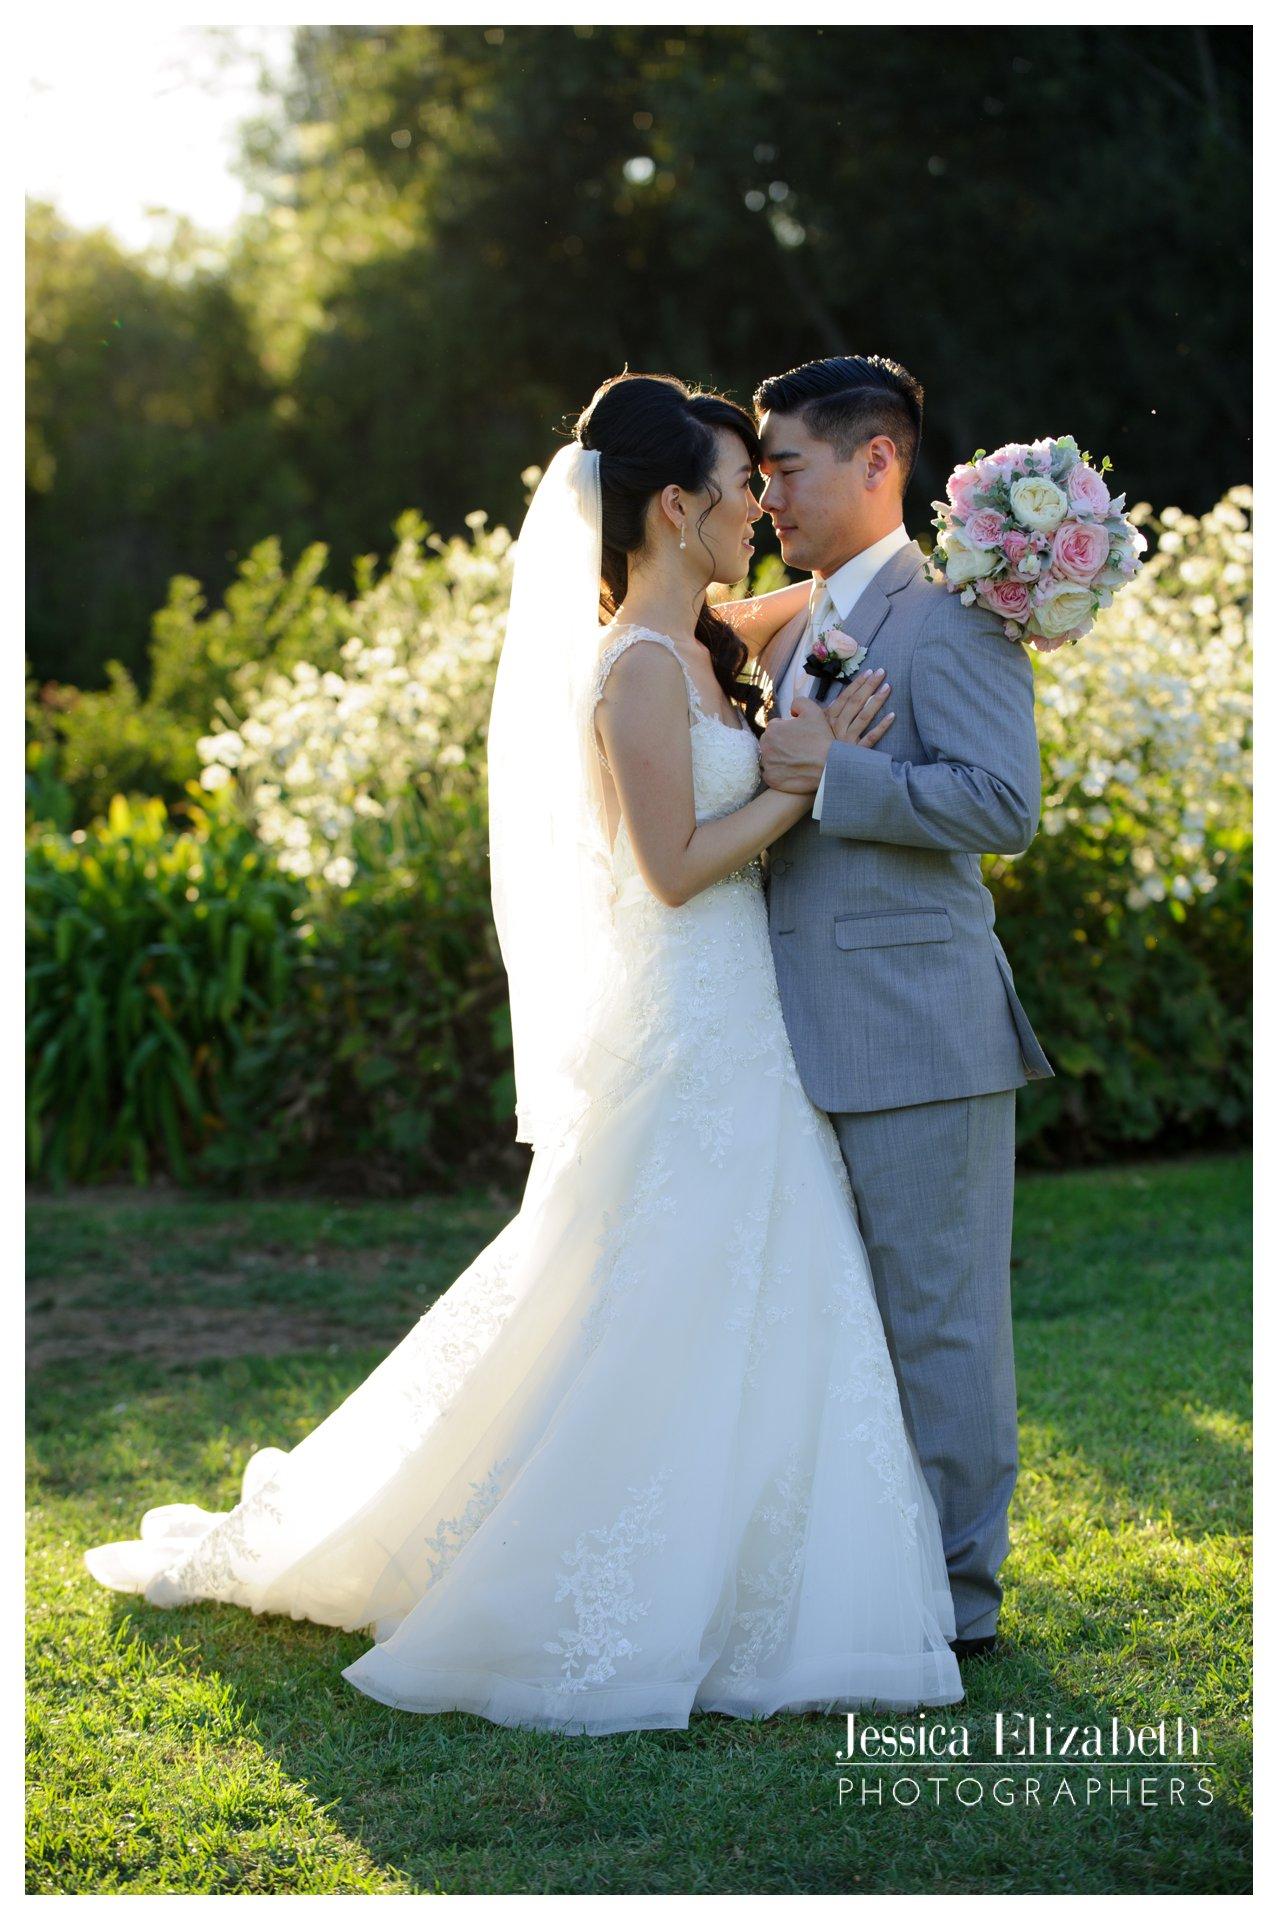 26-South Coast Botanic Garden Palos Verdes Wedding Photography by Jessica Elizabeth